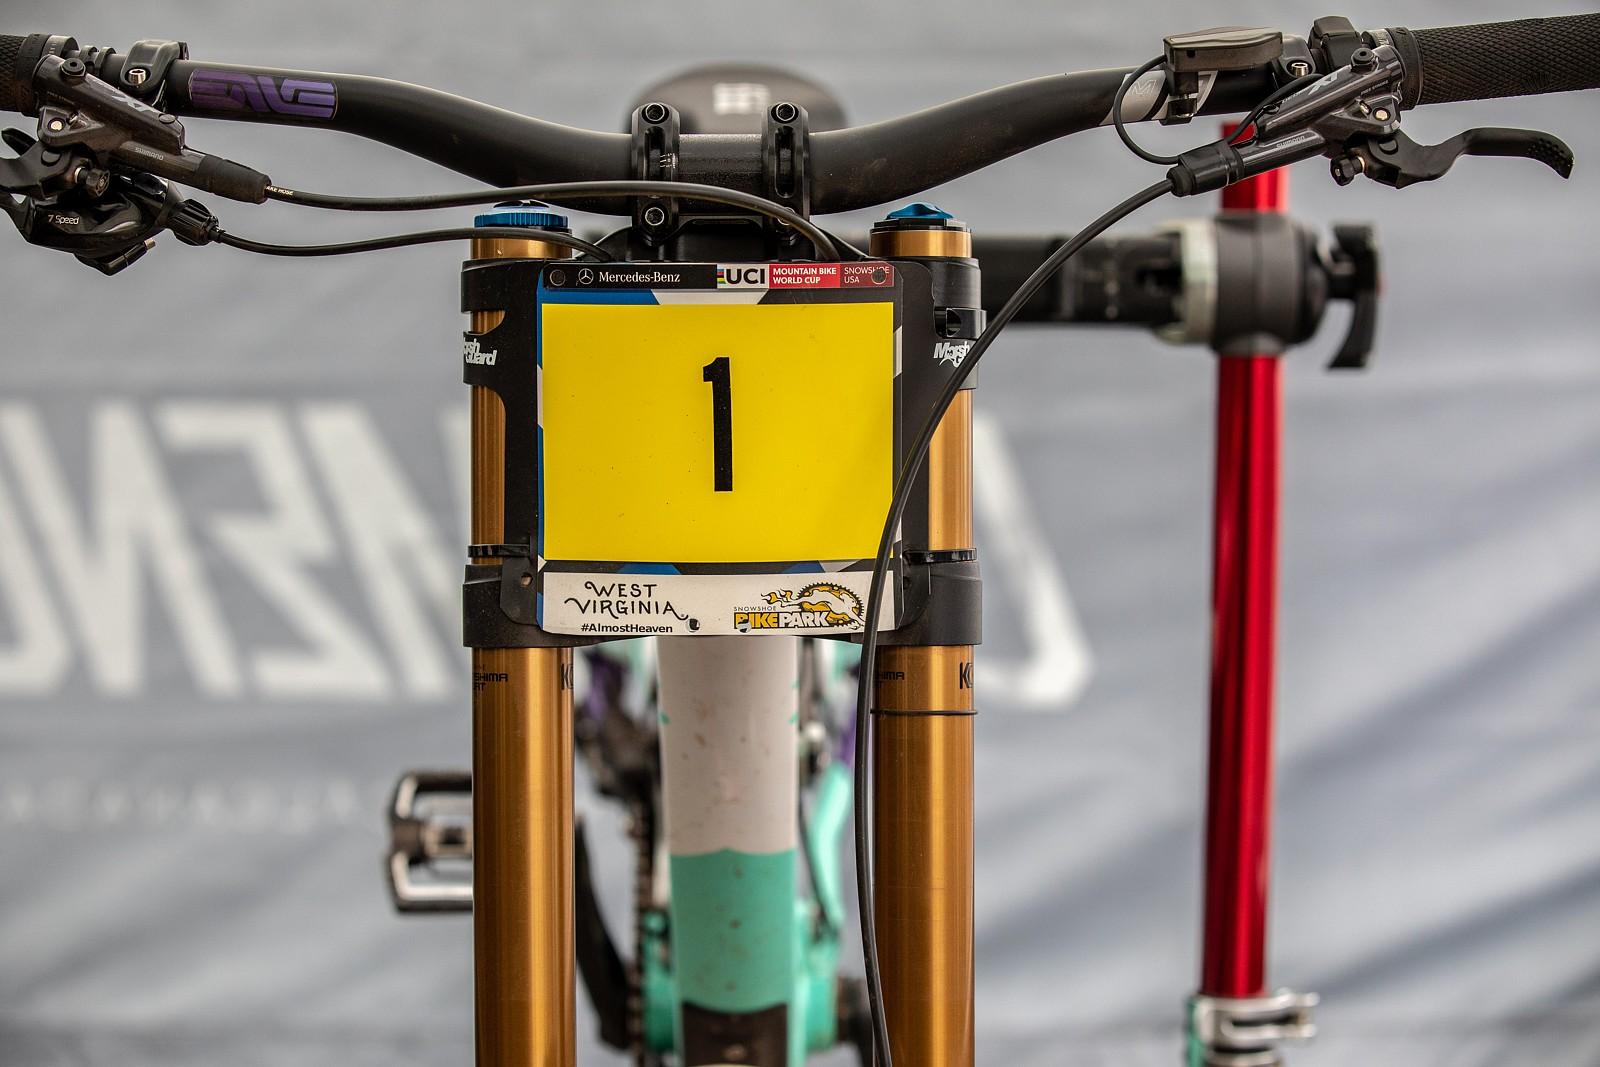 Thibaut Daprela's Commencal Supreme - PIT BITS 2 - Snowshoe World Cup Downhill - Mountain Biking Pictures - Vital MTB